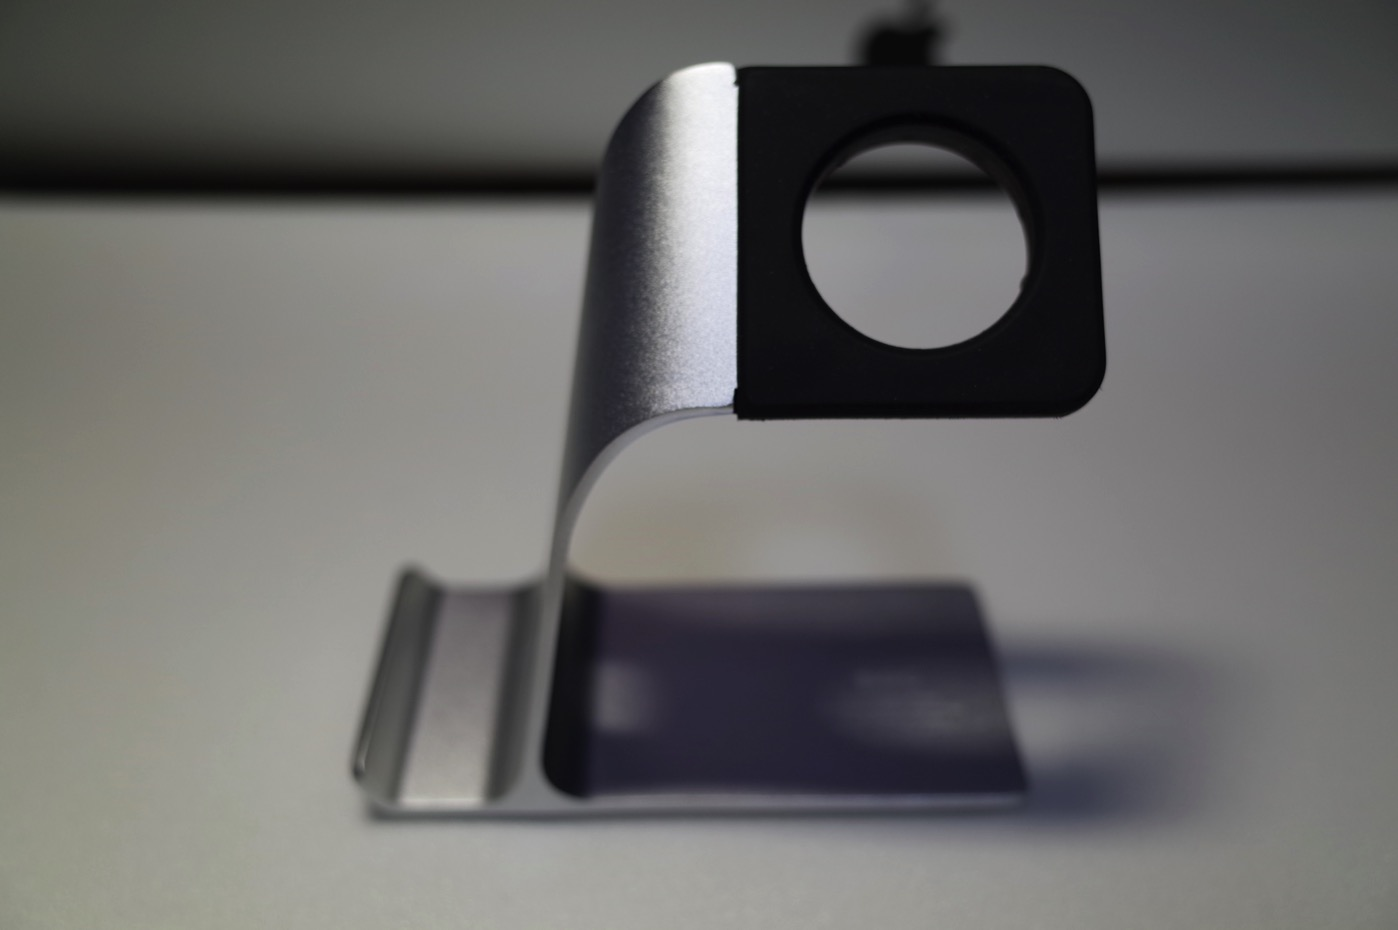 Apple Watch スタンド-6